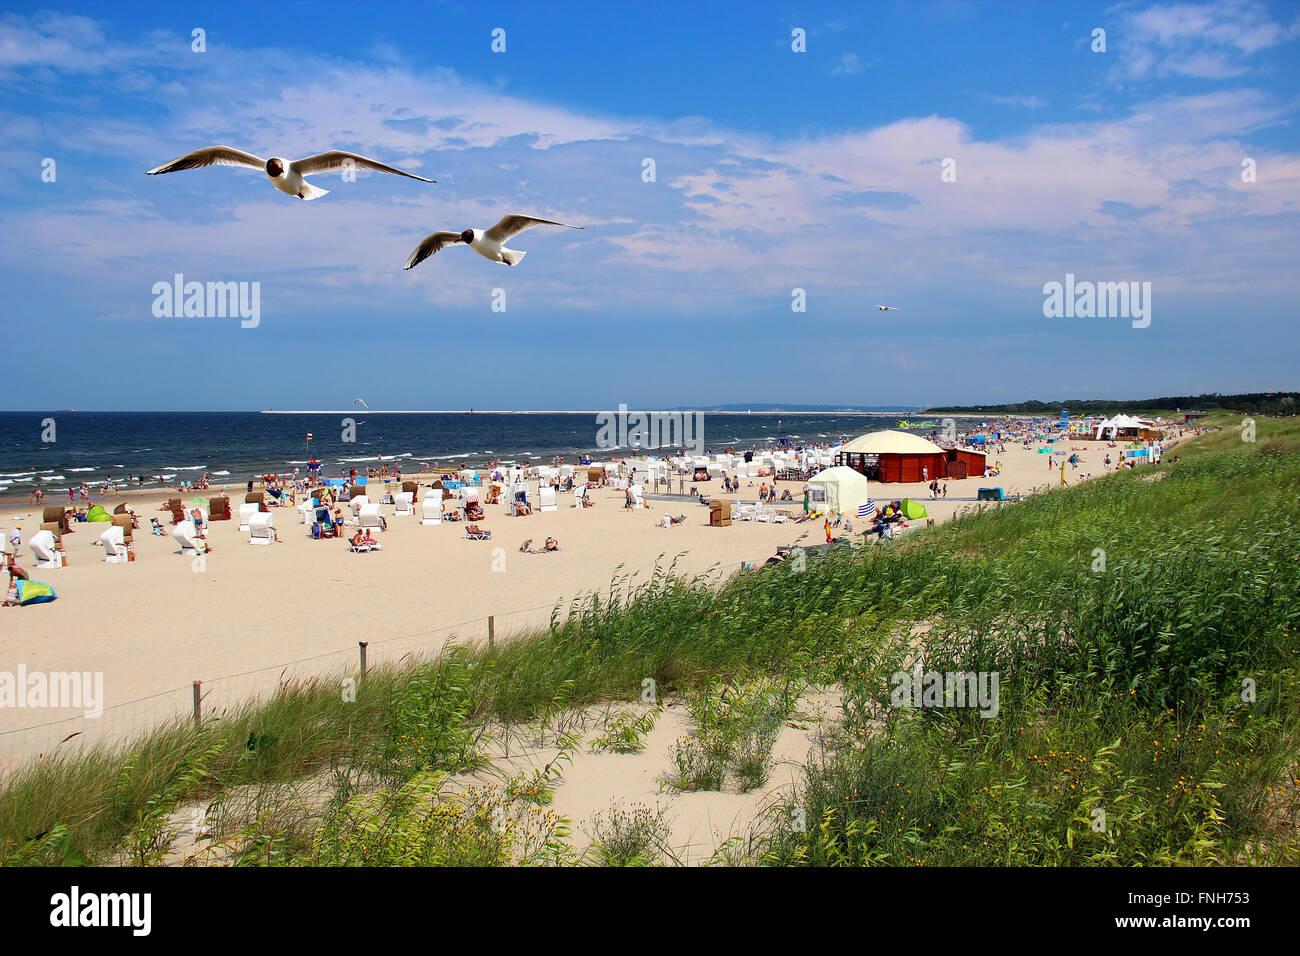 Popular Baltic sea beach on Usedom island in Swinoujscie, Poland Stock Photo